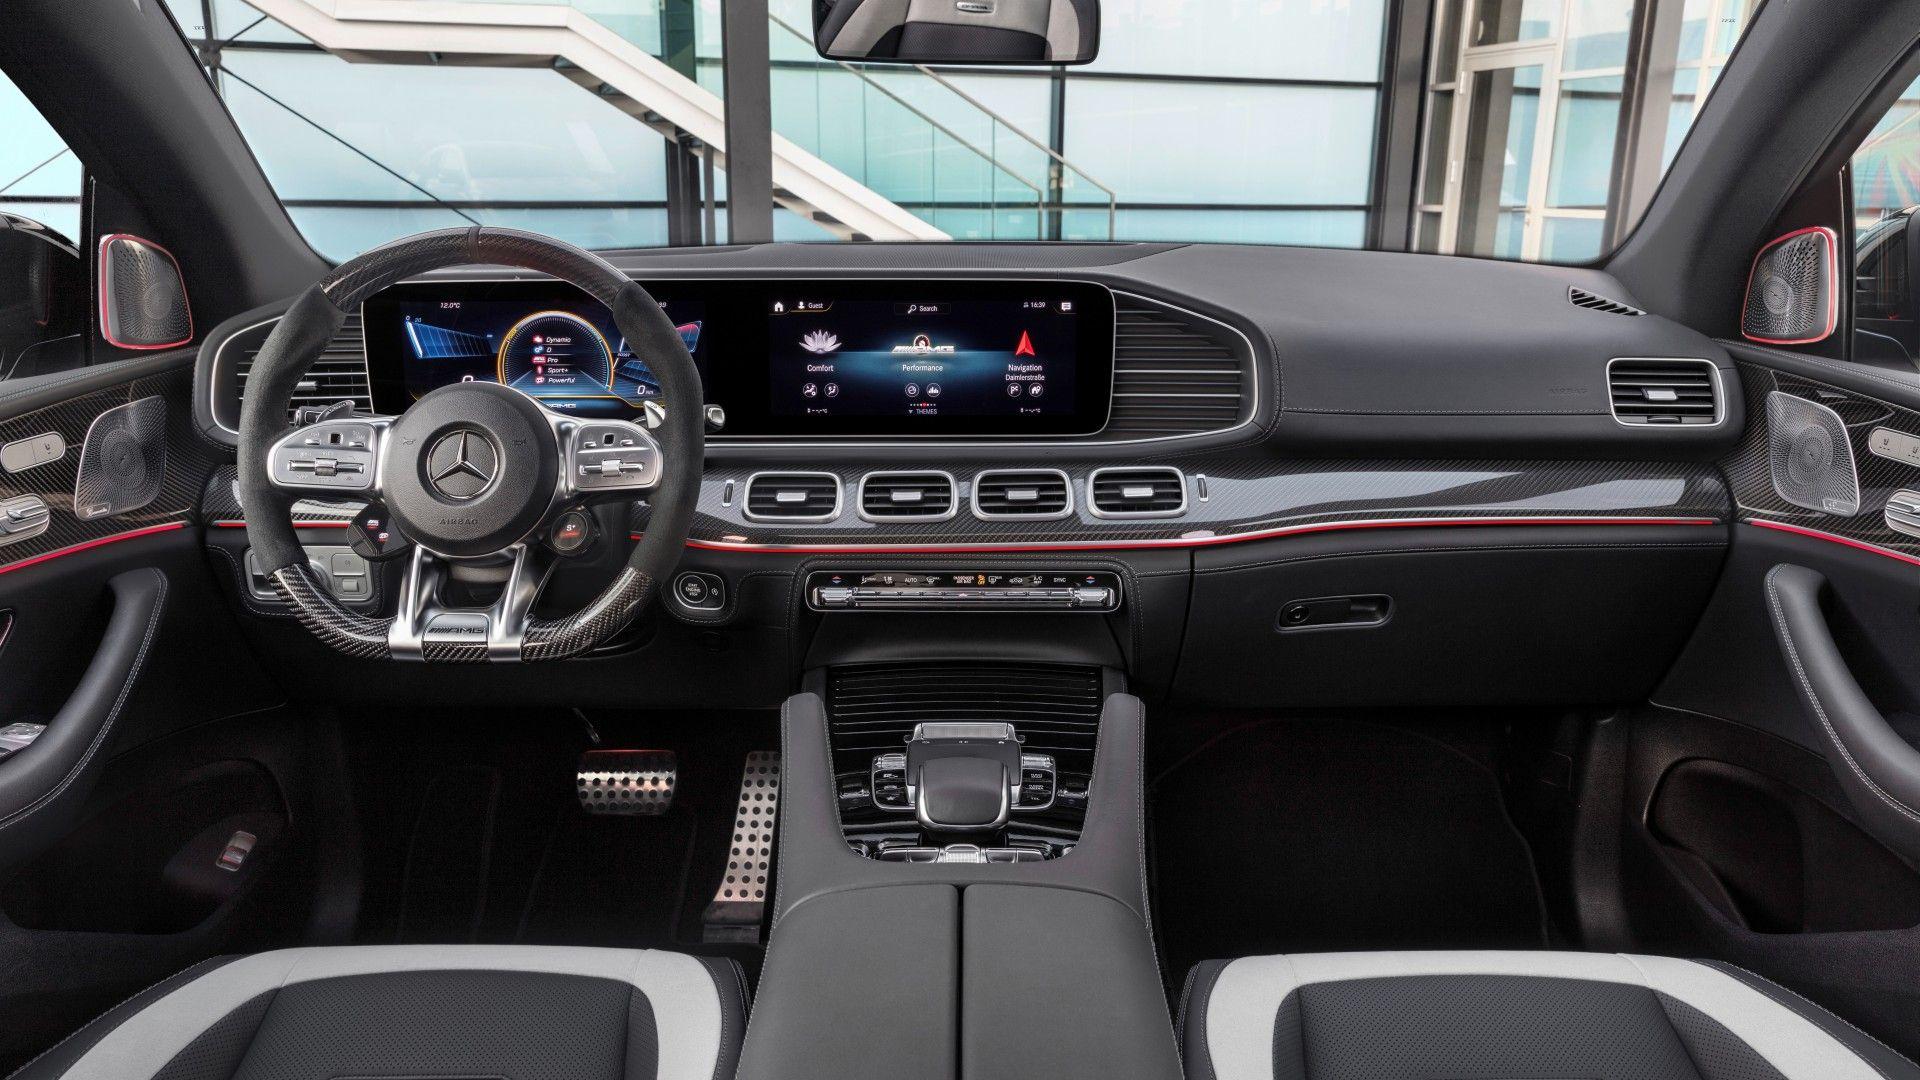 Mercedes AMG GLE 63 S 4Matic Coupé 2020 (2)